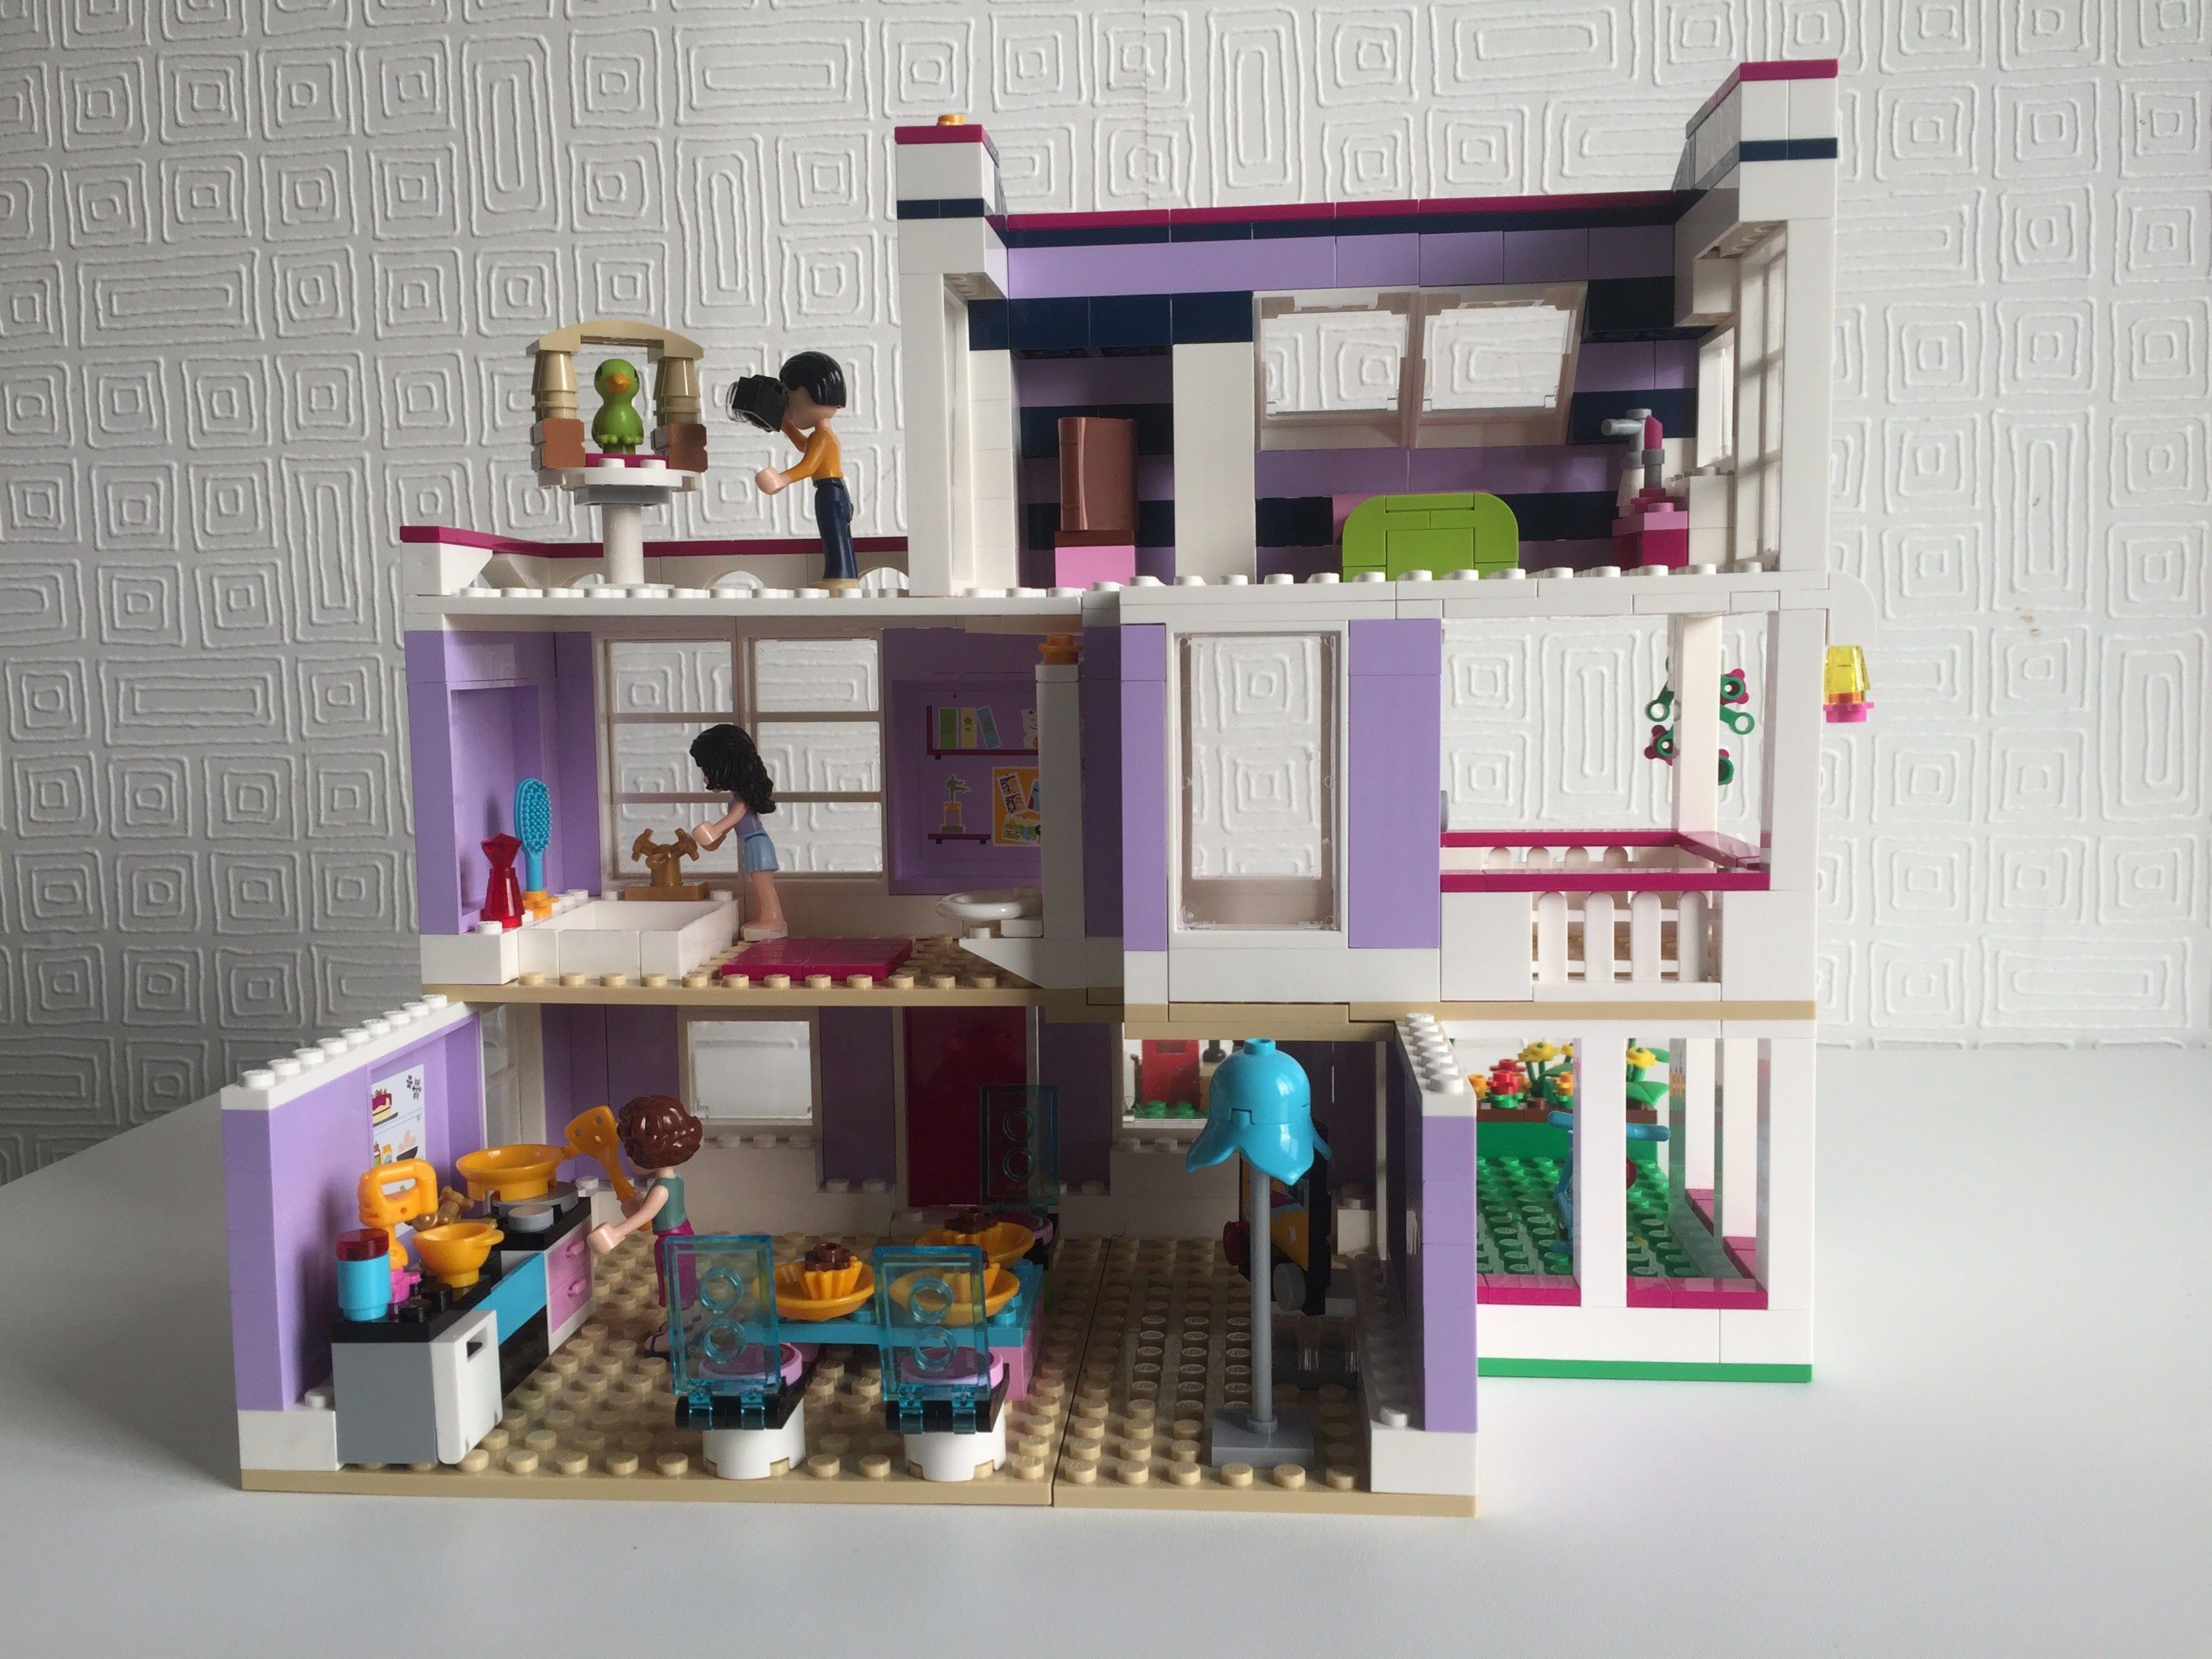 Moc 41095 Emma S House Emma S Huis Lego Friends Alternate Moc Lego Legofriends 41095 Emma Moc Lego Friends Lego Friends Sets Lego Projects